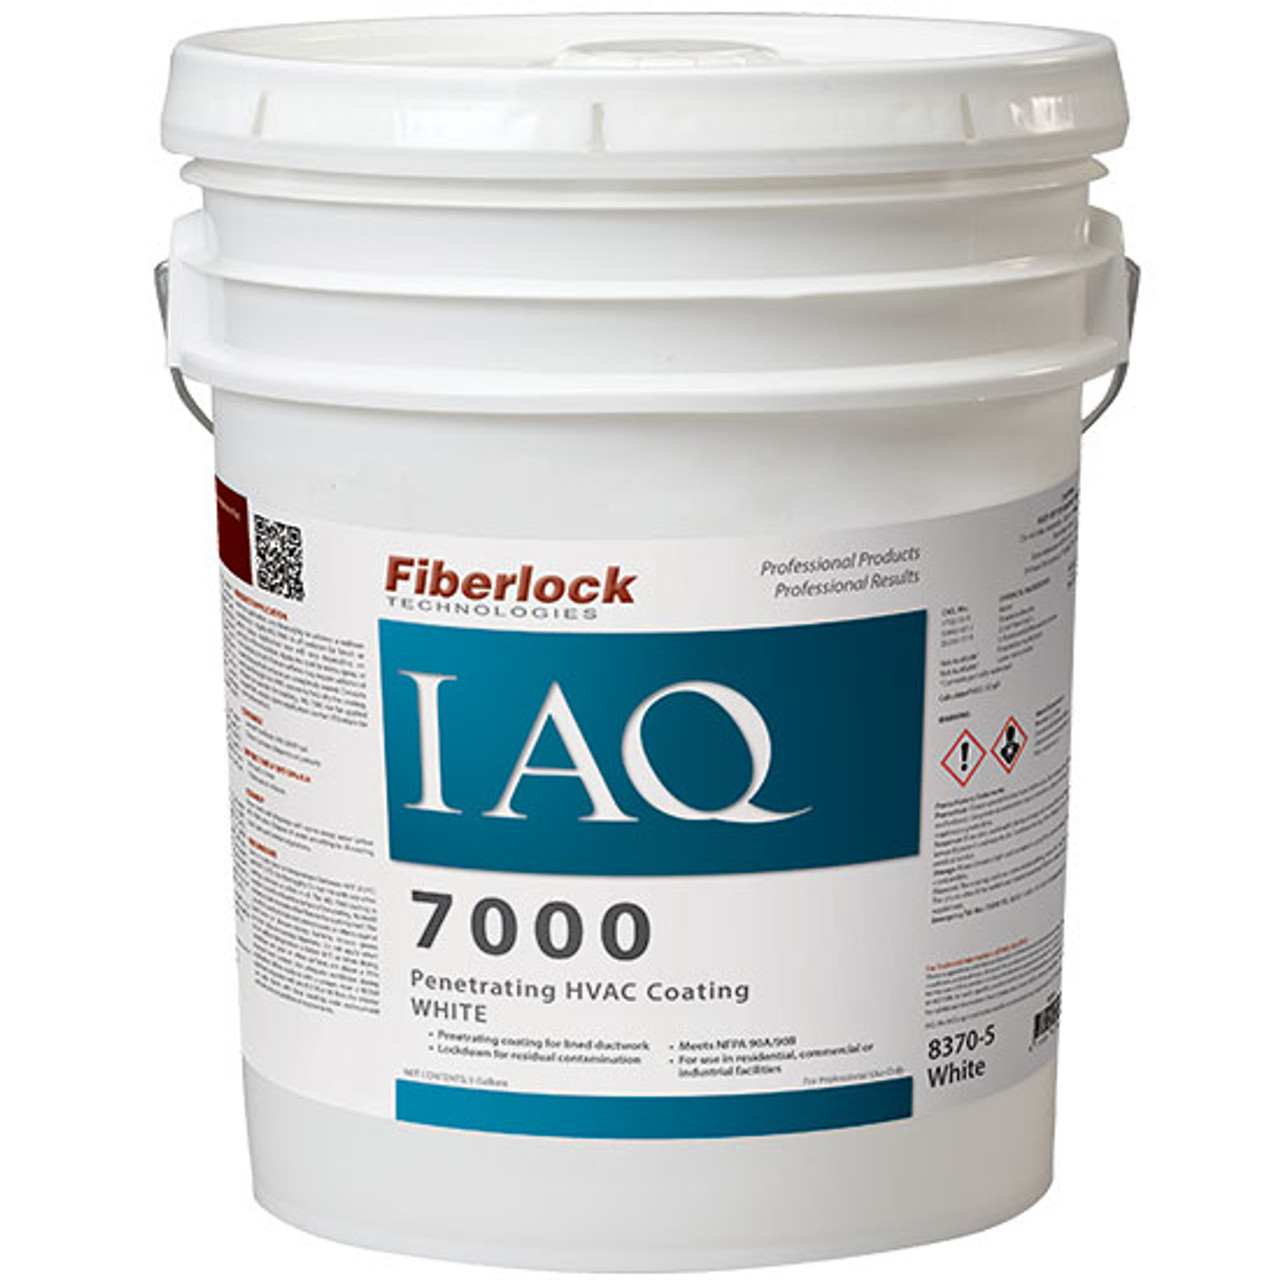 Fiberlock IAQ 7000 Penetrating HVAC Sealant, Coating/Encapsulant (5 GL)